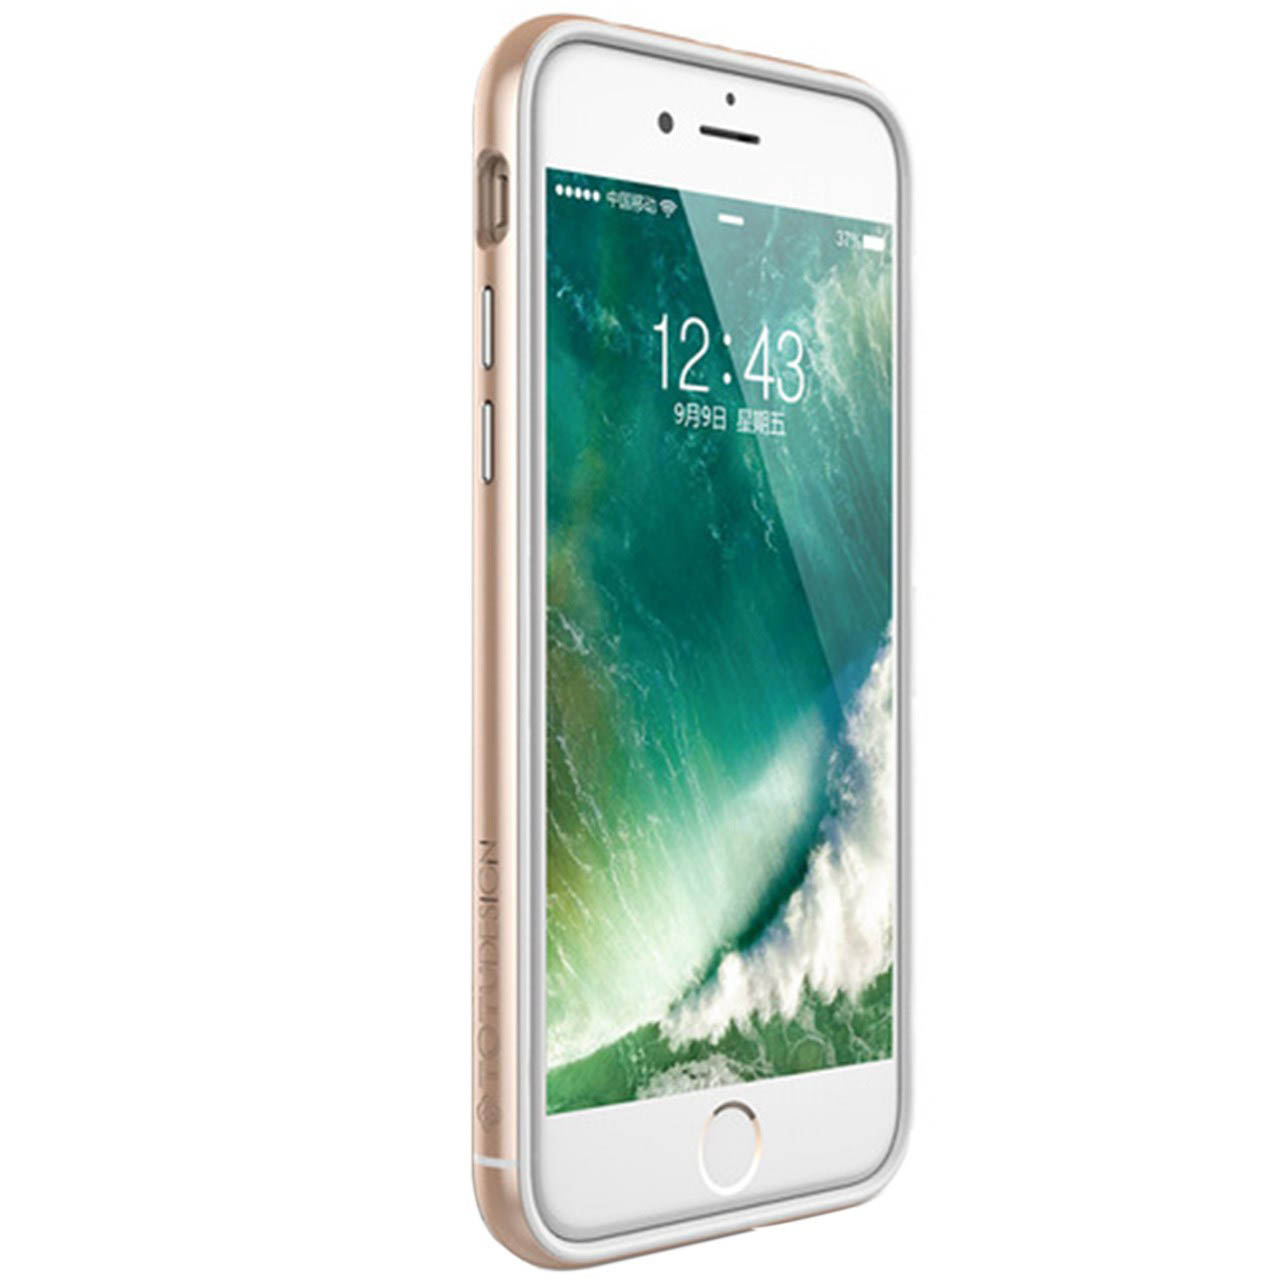 بامپر توتو مدل Design مناسب برای گوشی موبایل اپل Iphone 6 Plus / 6S Plus